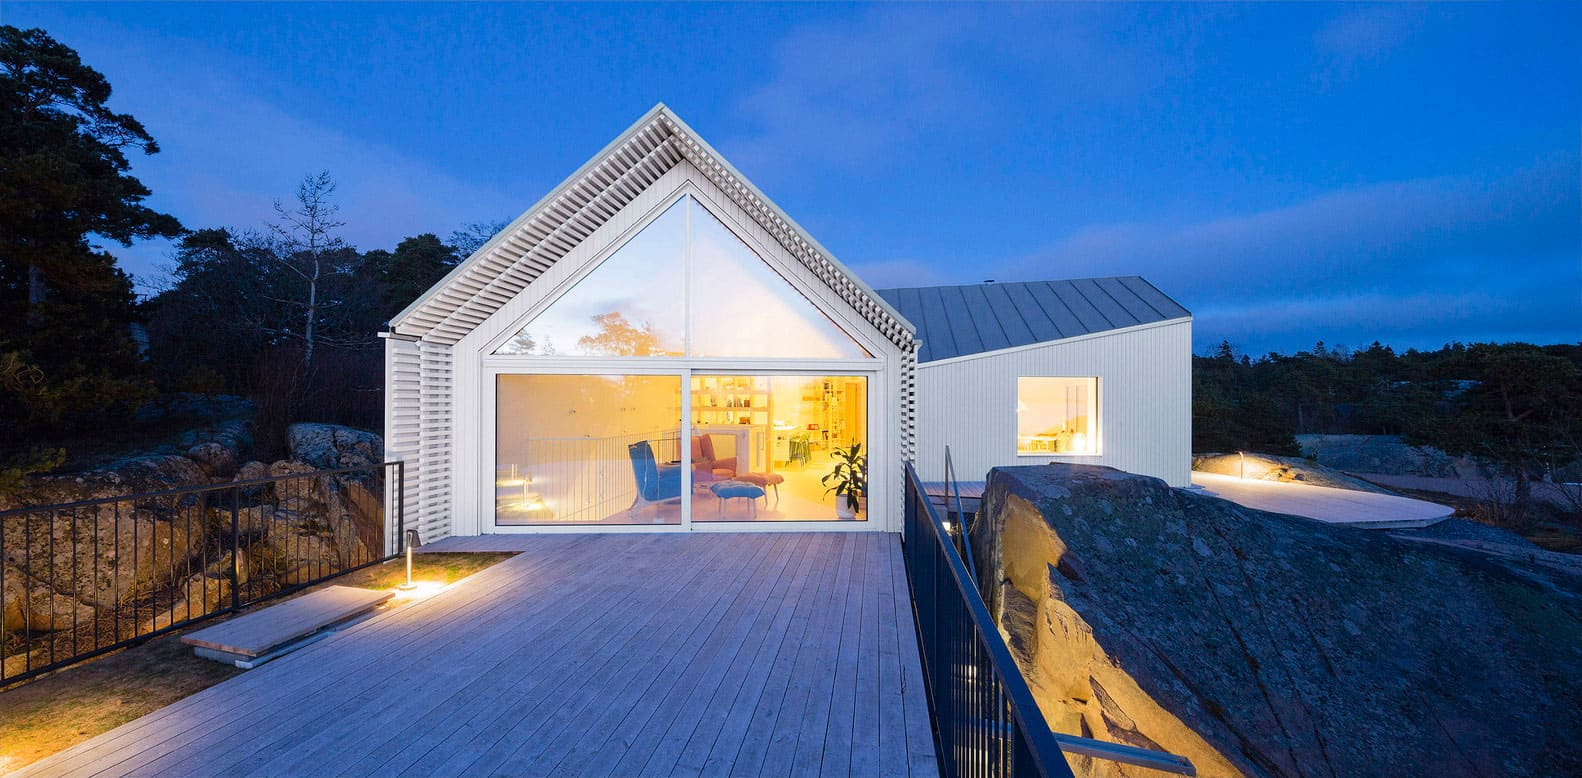 Beautiful Villa Located in Hanko, Finland Designed by Mer Arkkitehdit